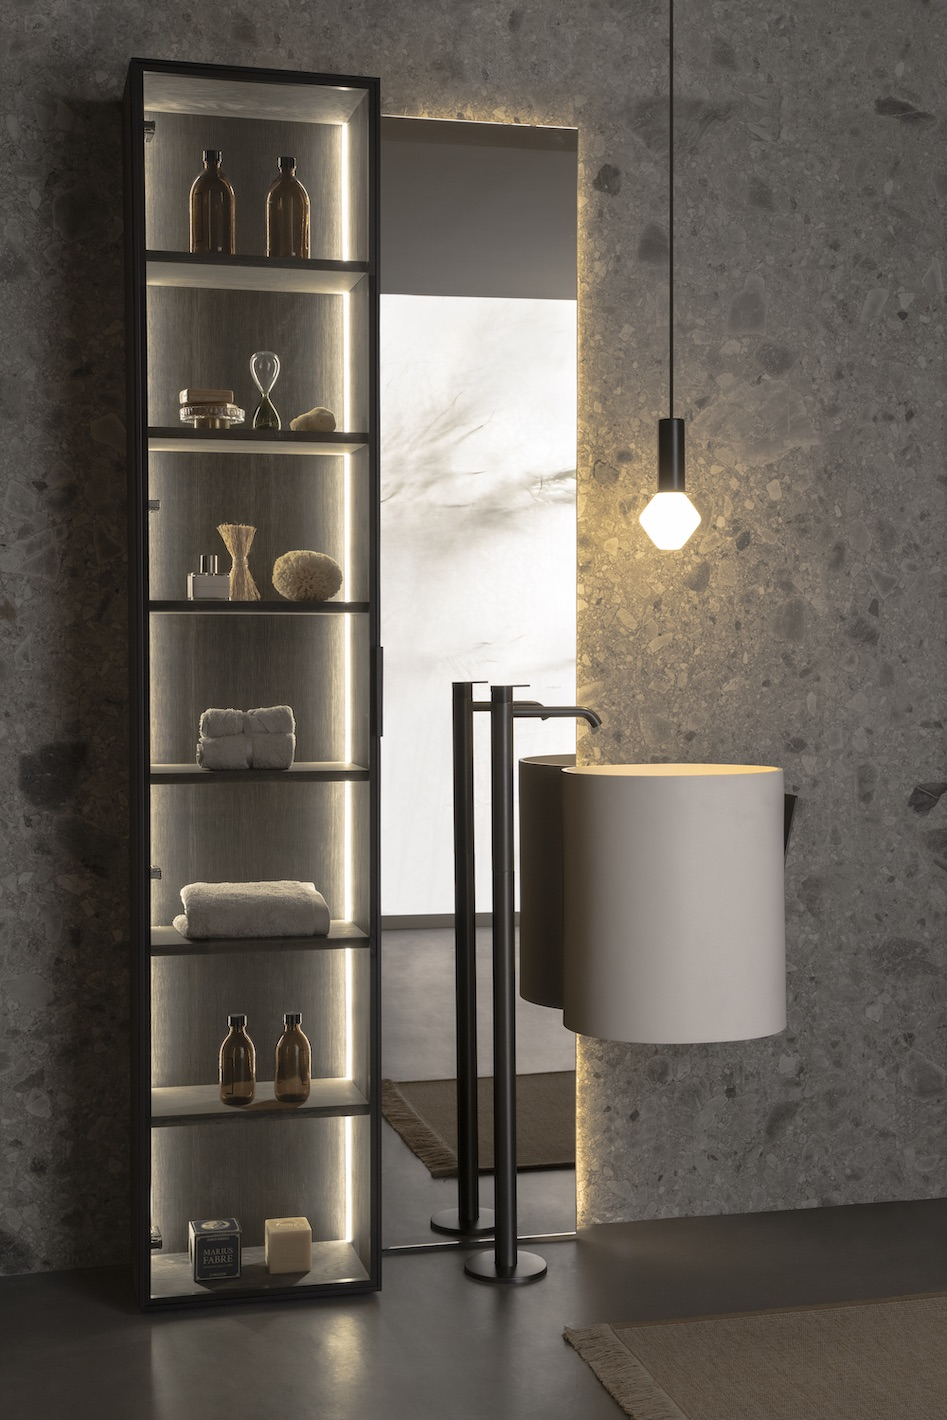 interiorismo_showroom_inbani_2.jpeg